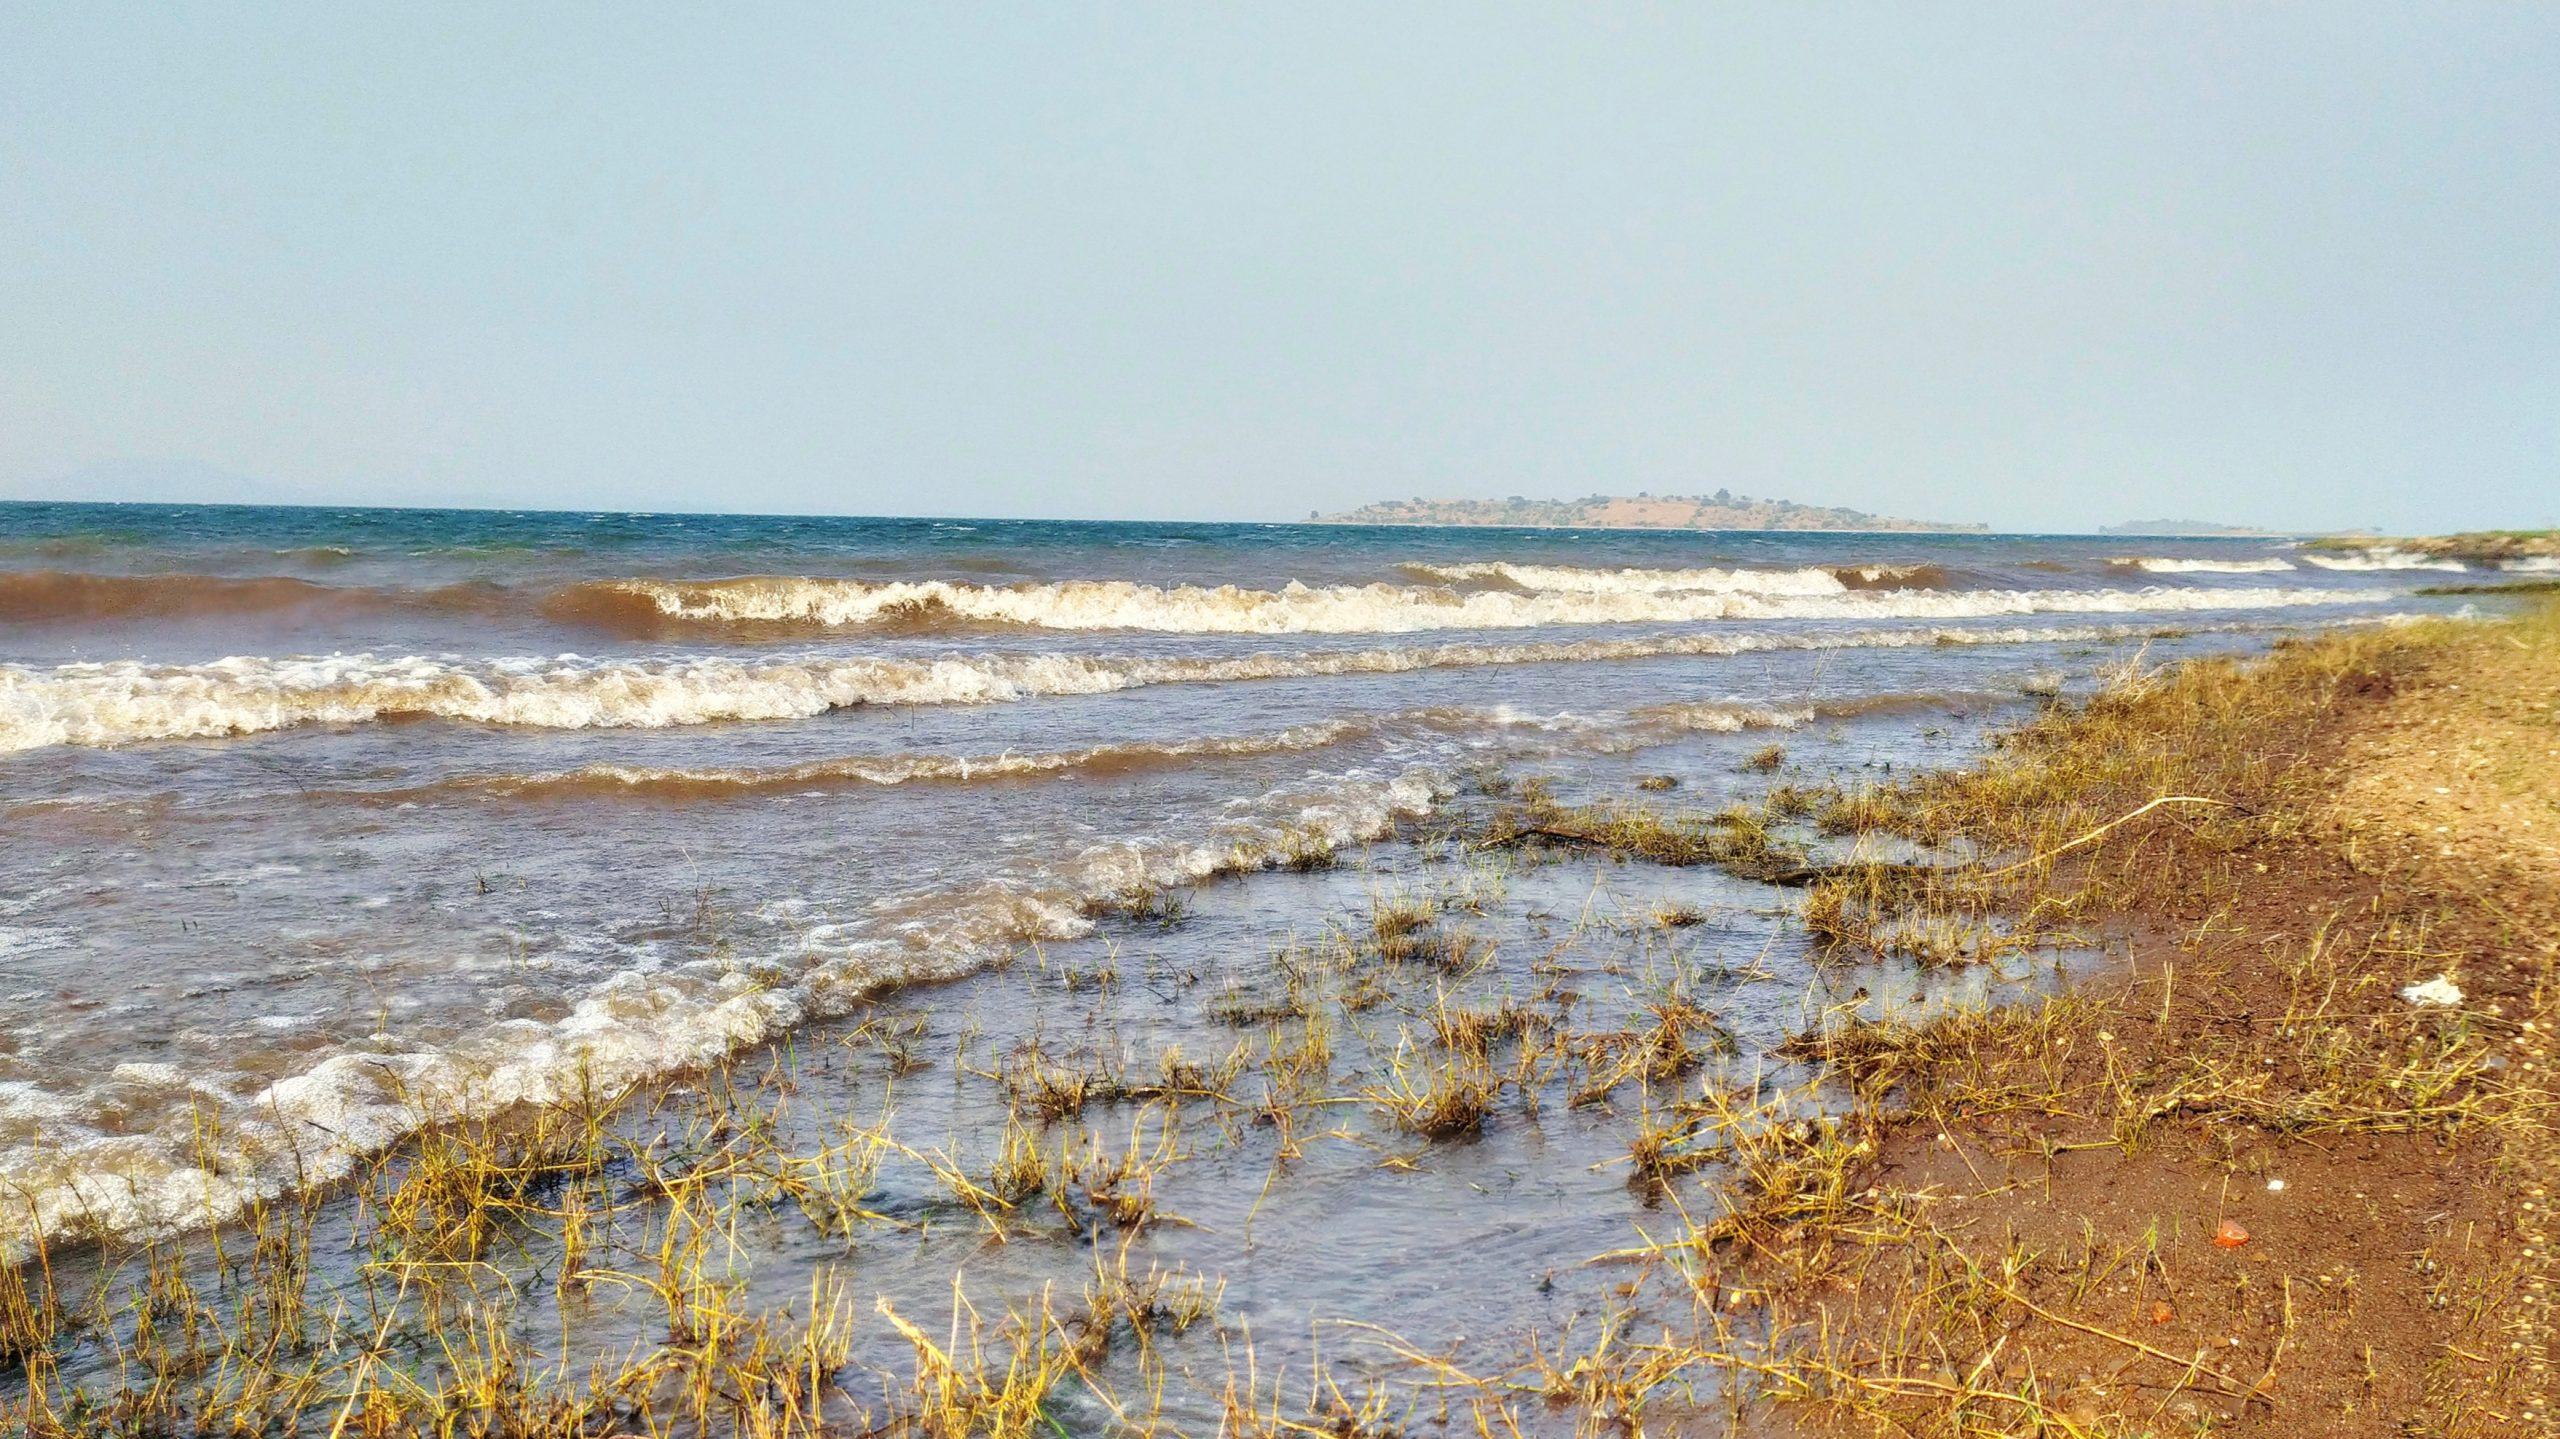 Selud beach Gujarat